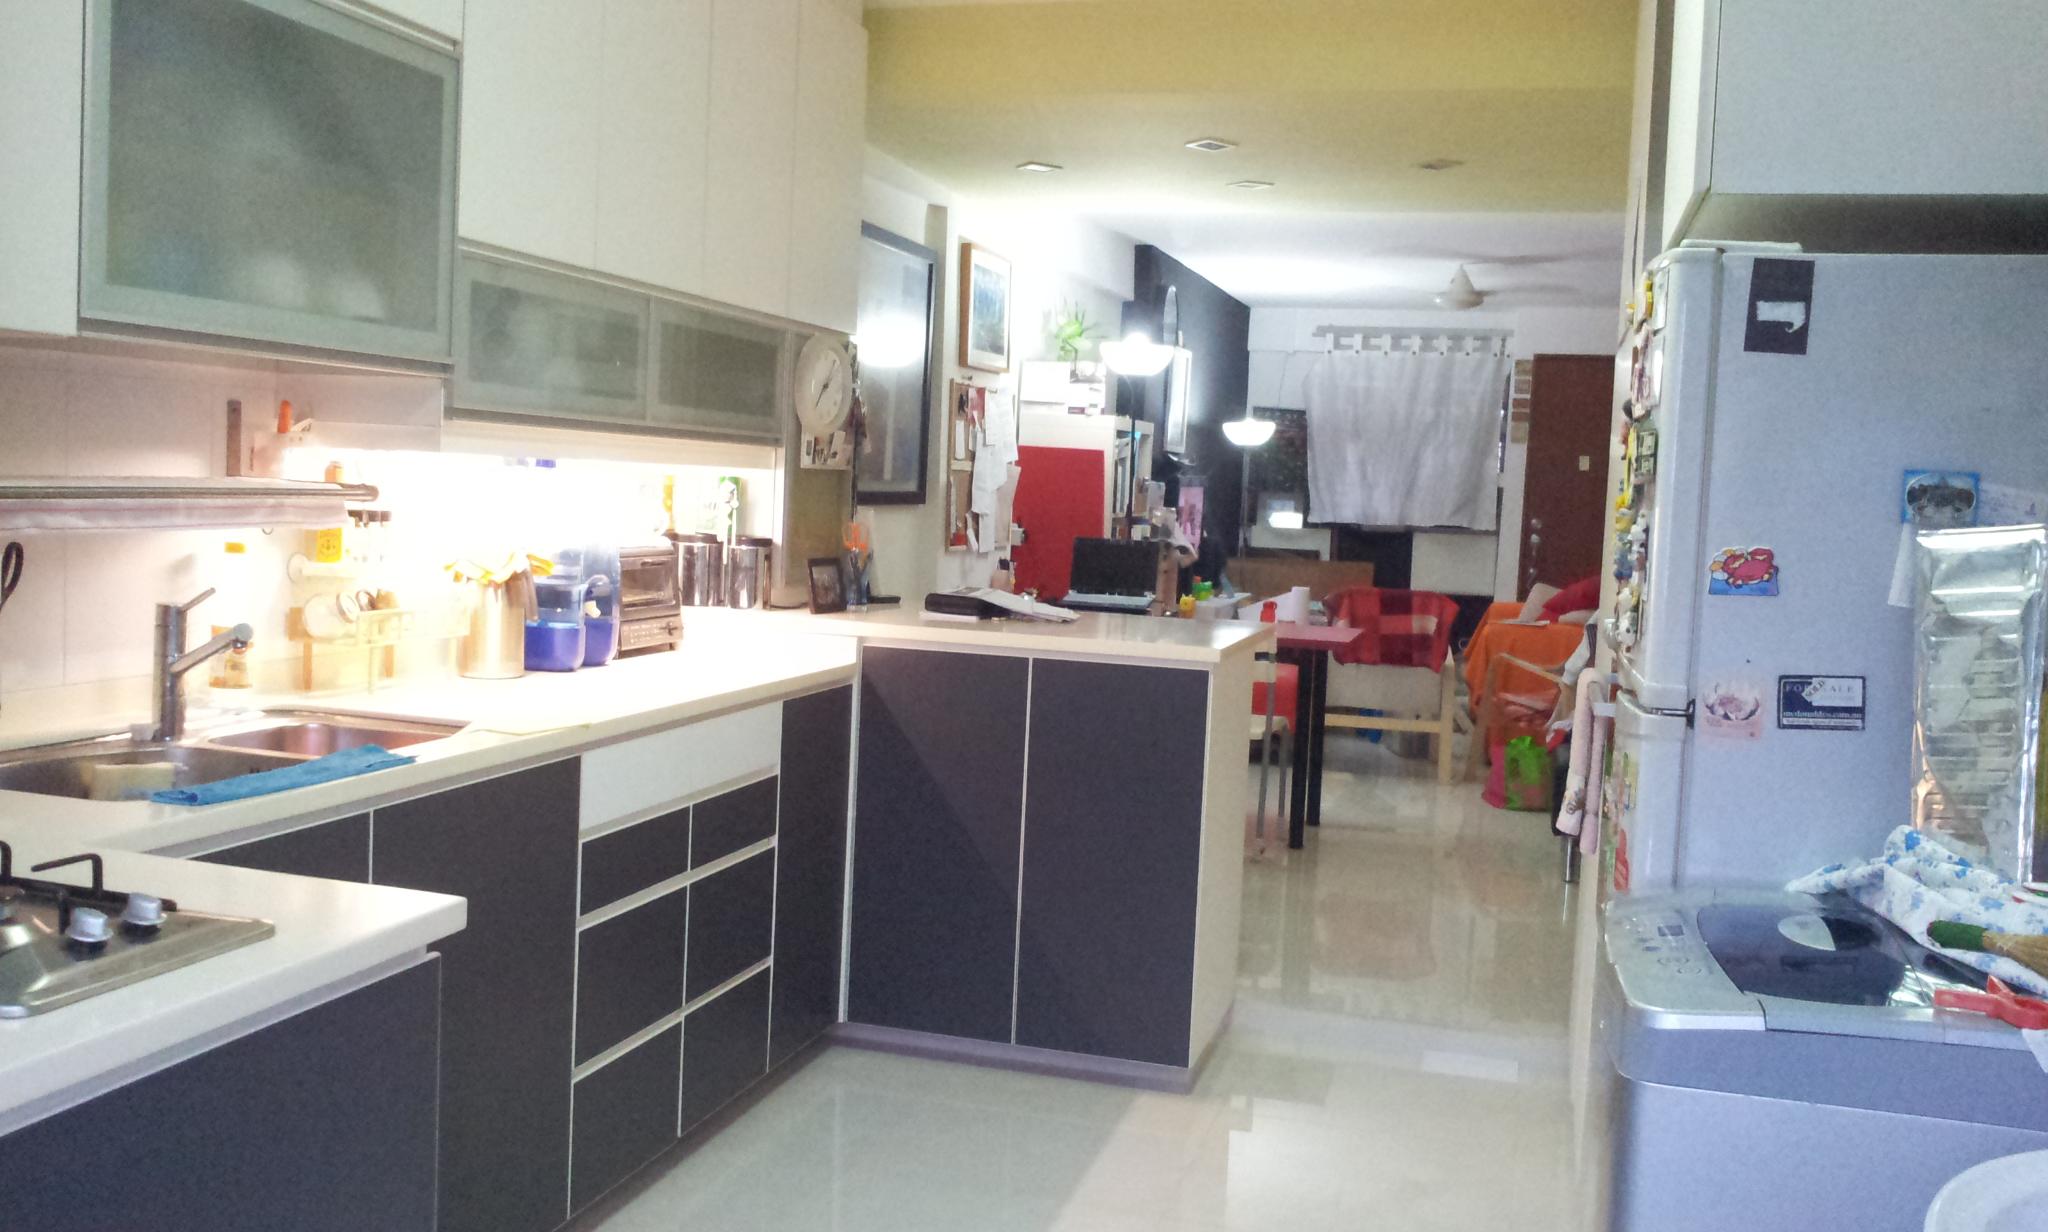 Singapore Aljunied Crescent 3 Room HDB Flat for Rent